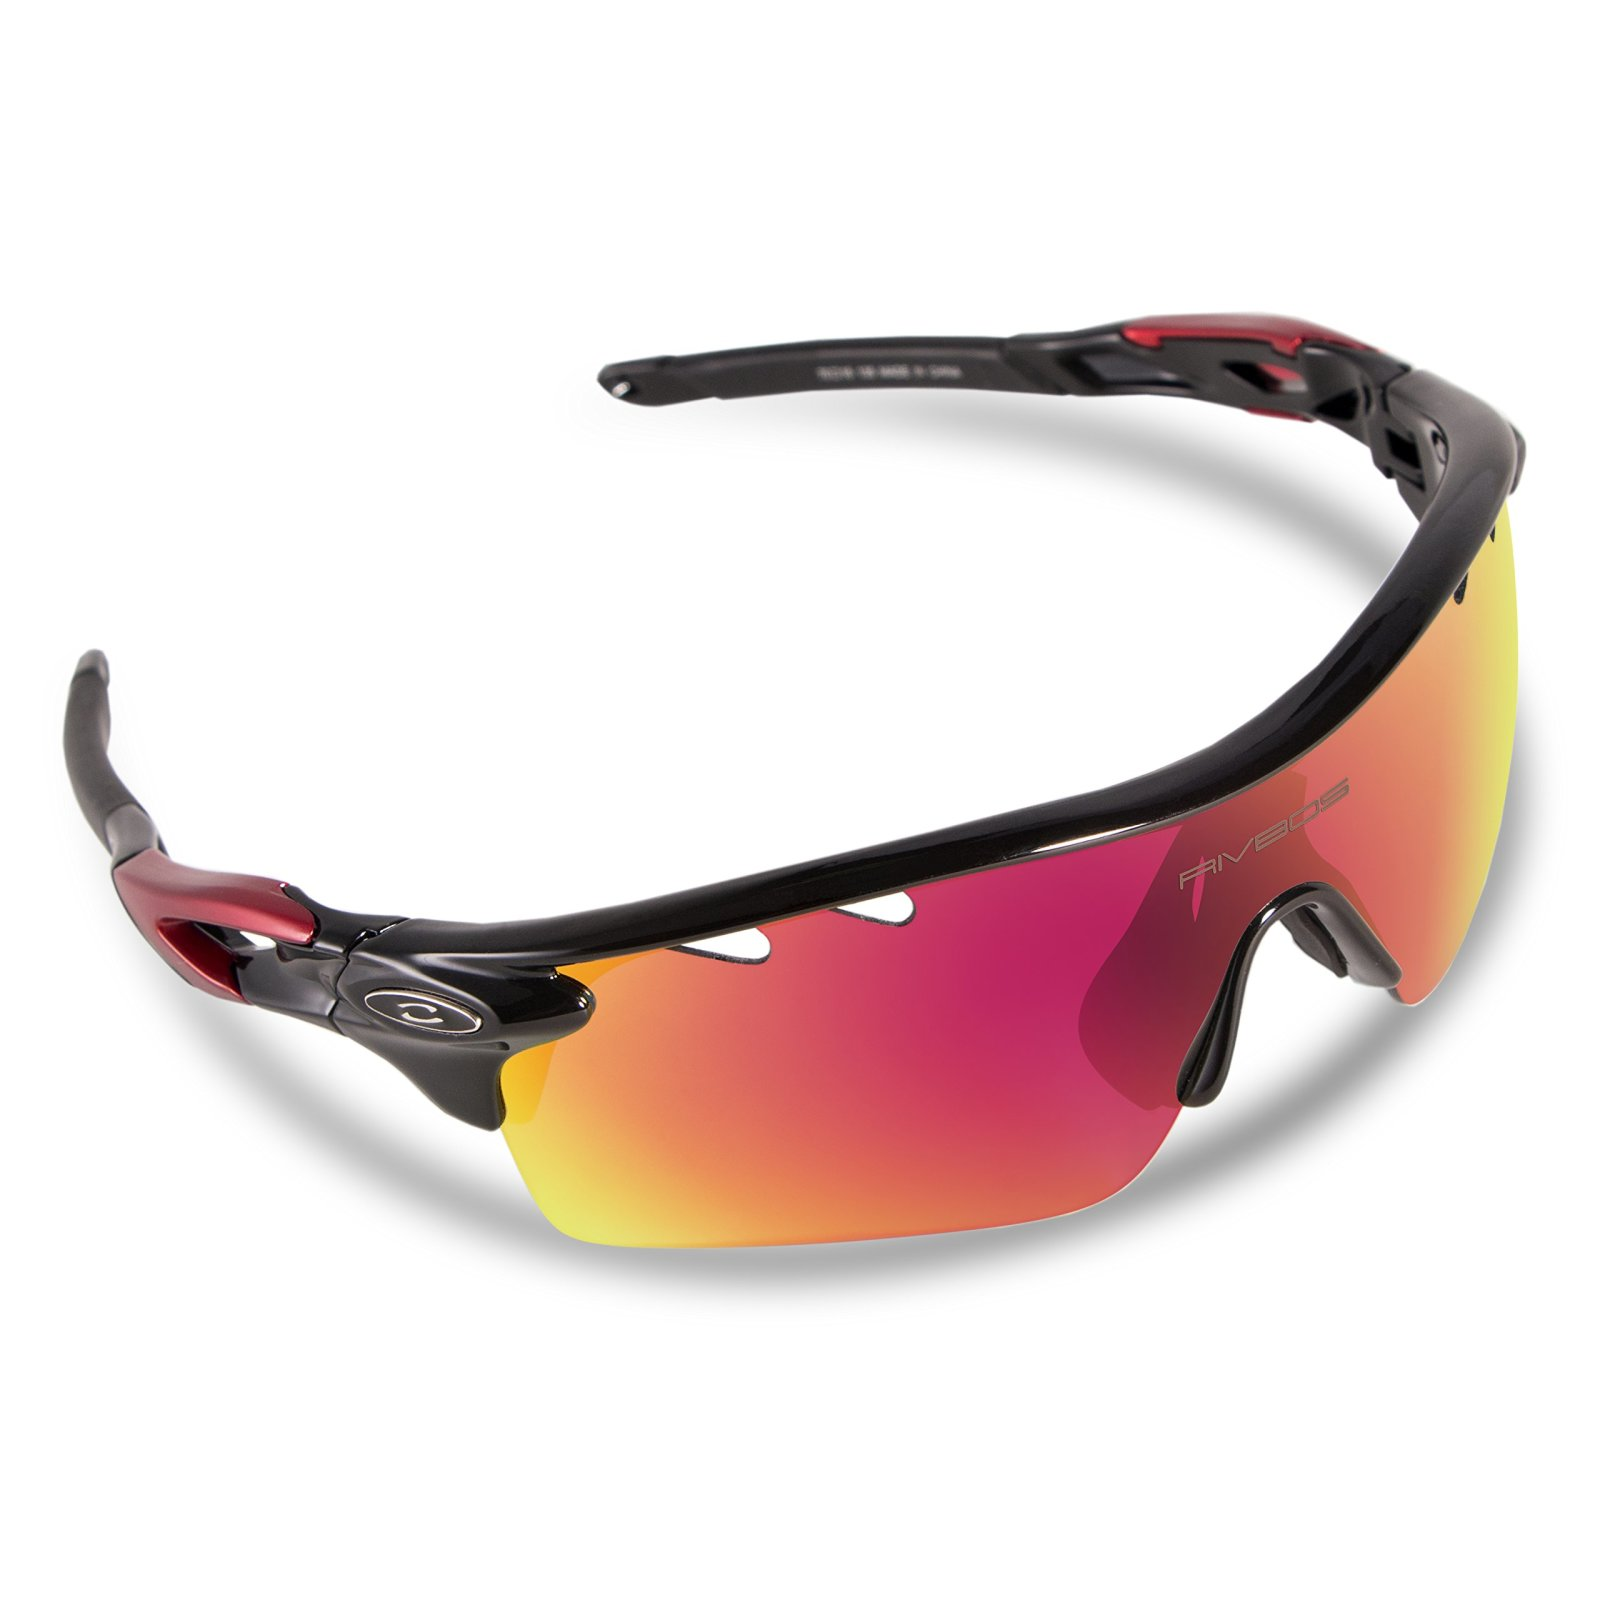 719b38d9ff RIVBOS Polarized Sports Sunglasses Sun Glasses 5 Interchangeable Lenses Red  New